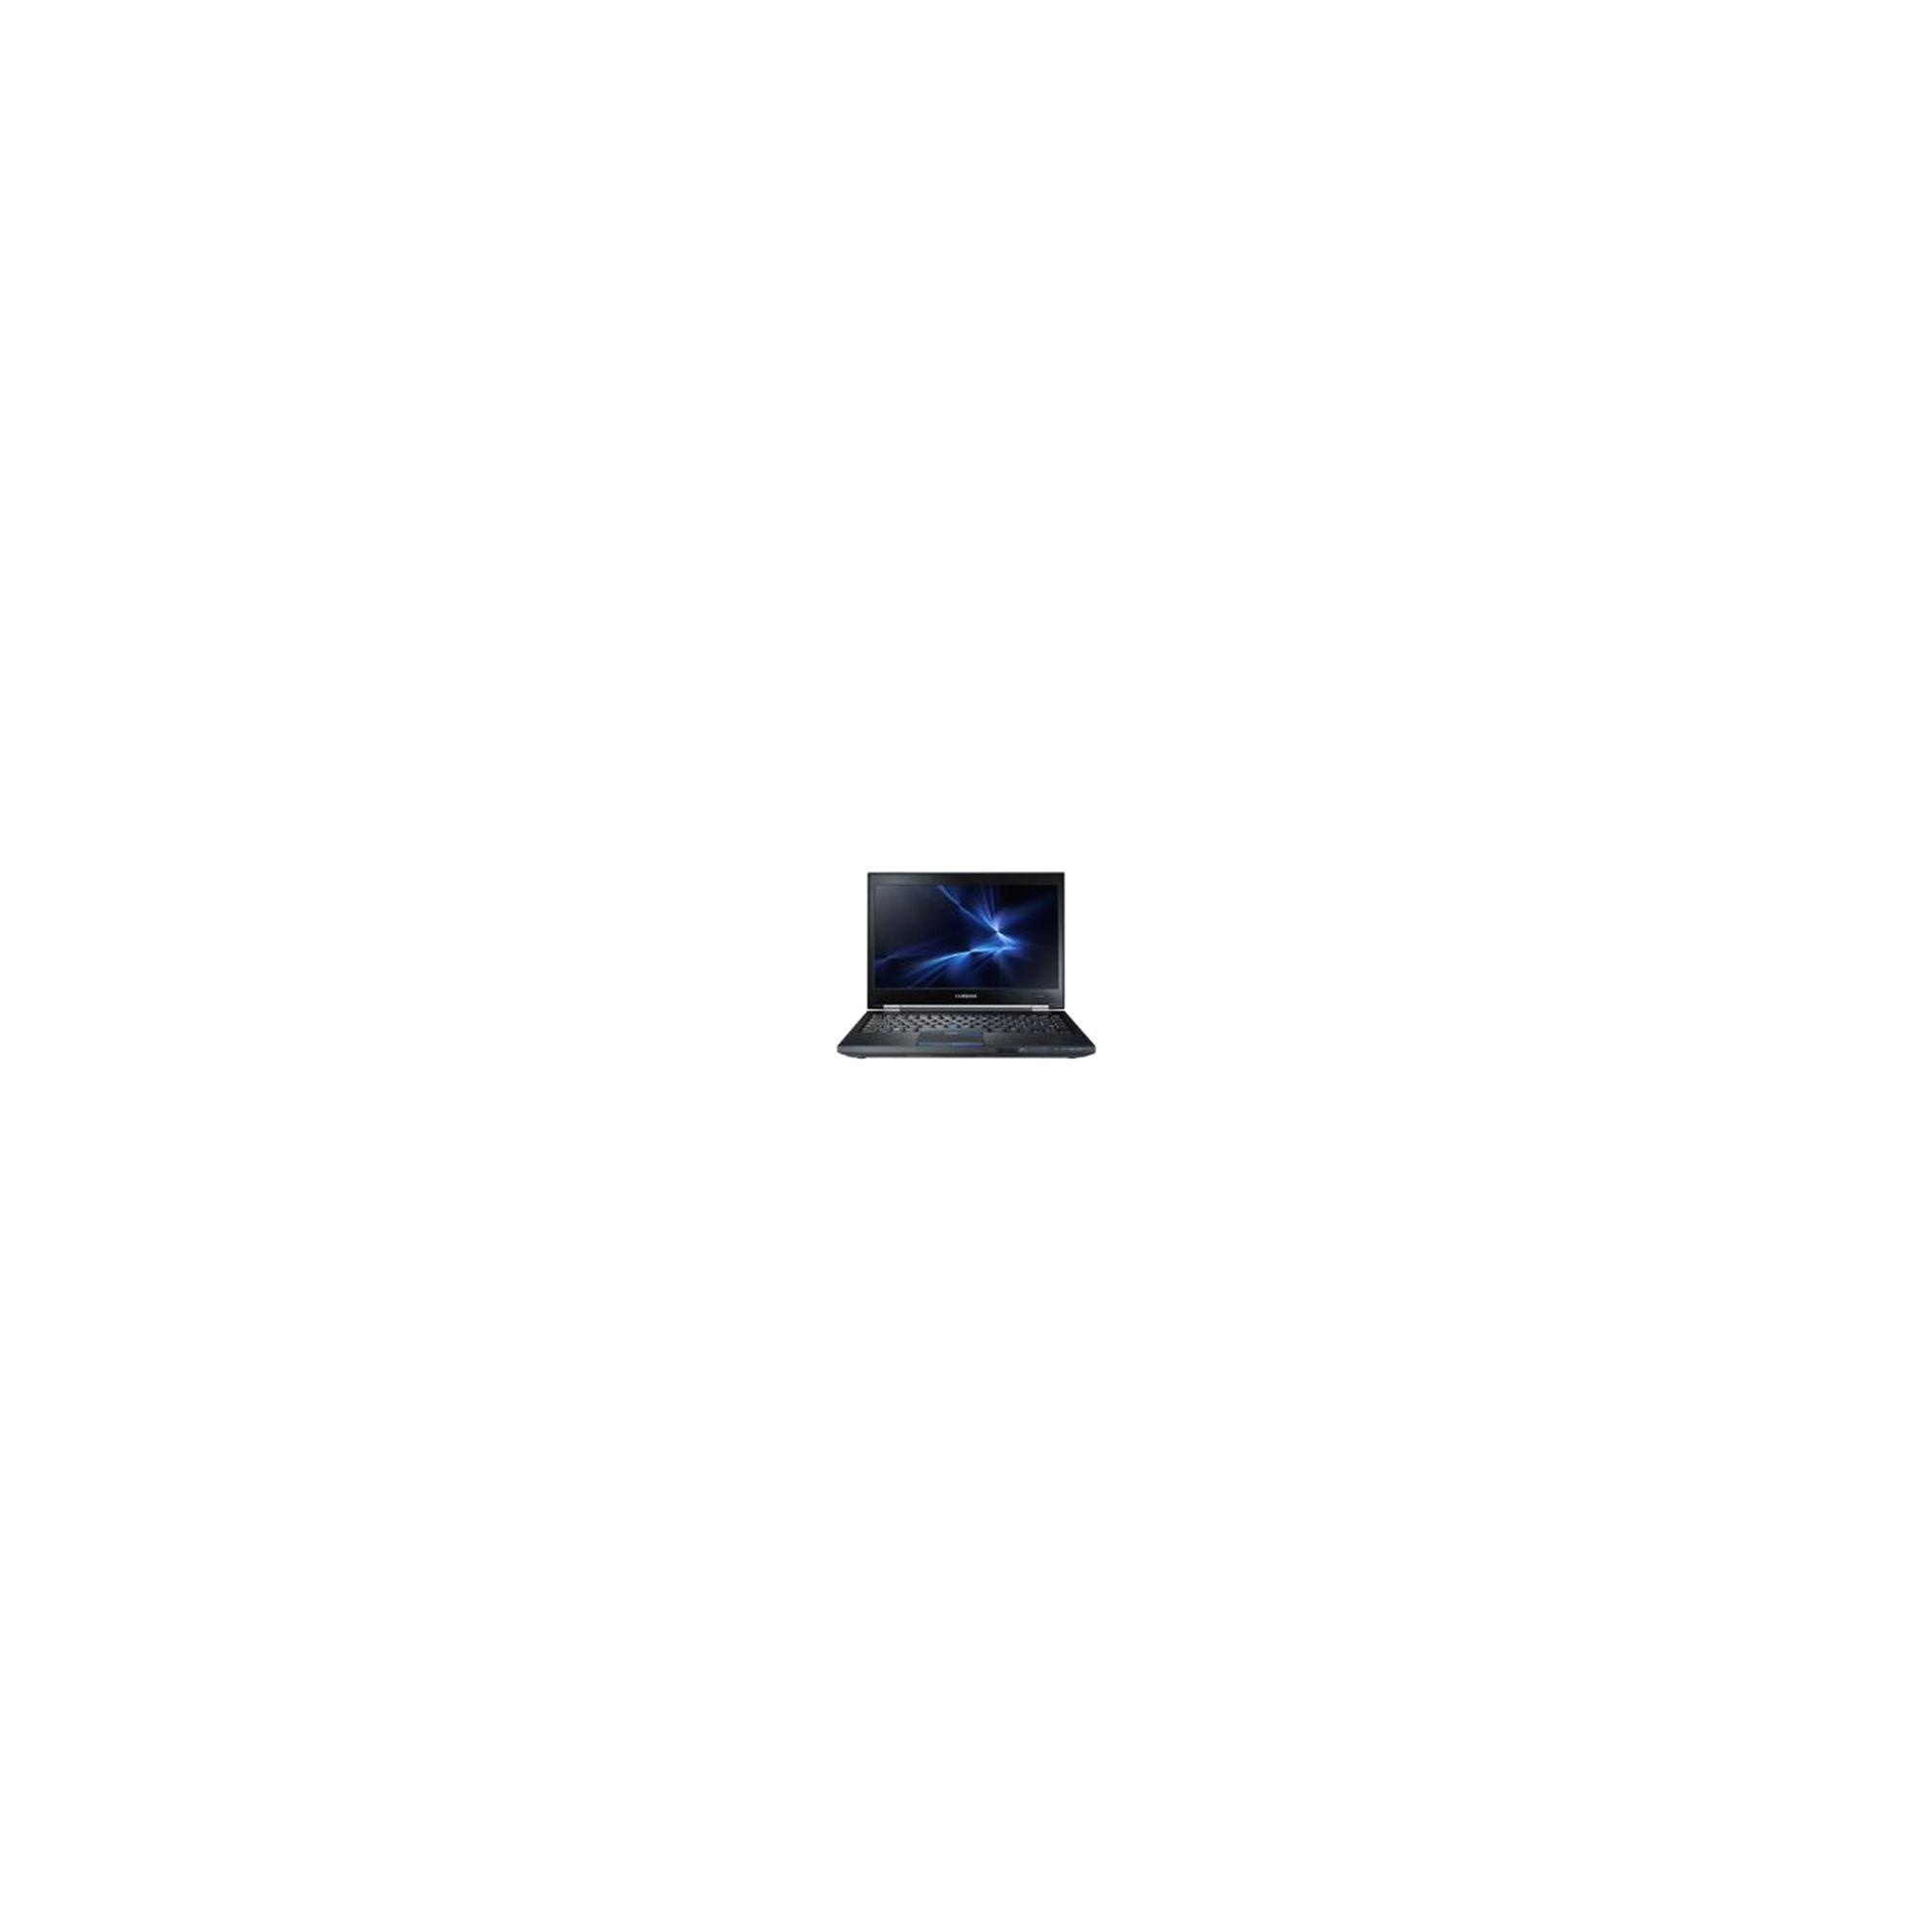 Samsung 400B4C (14 inch) Notebook PC Core i5 (3210M) 2.5GHz 4GB 500GB DVD-SuperMulti DL WLAN BT Webcam Windows 7 Pro 64-bit (Intel HD Graphics 4000) at Tesco Direct